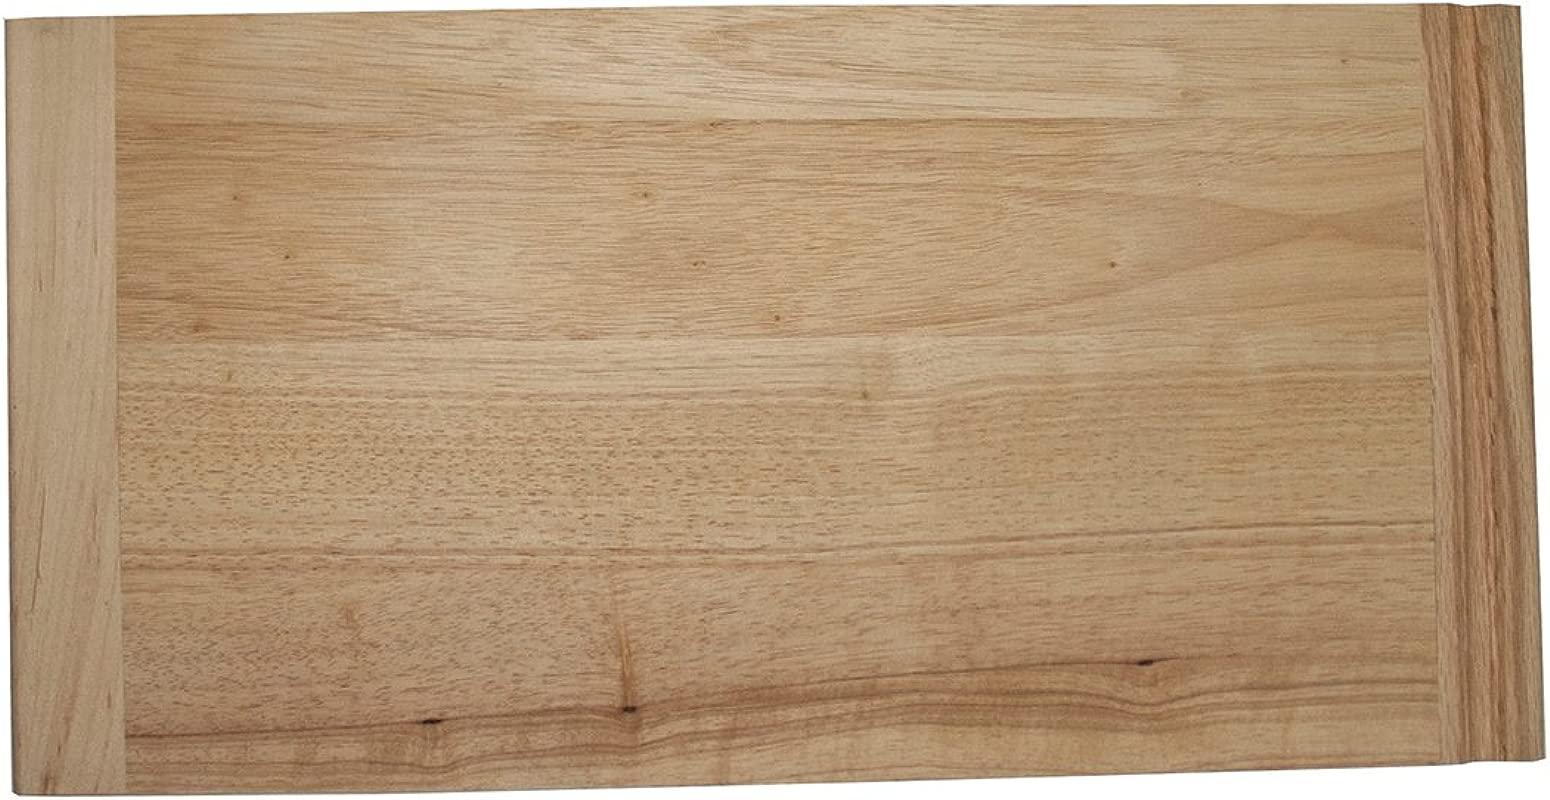 Omega National Rubberwood Bread Board 3 4 X 14 X 23 1 2